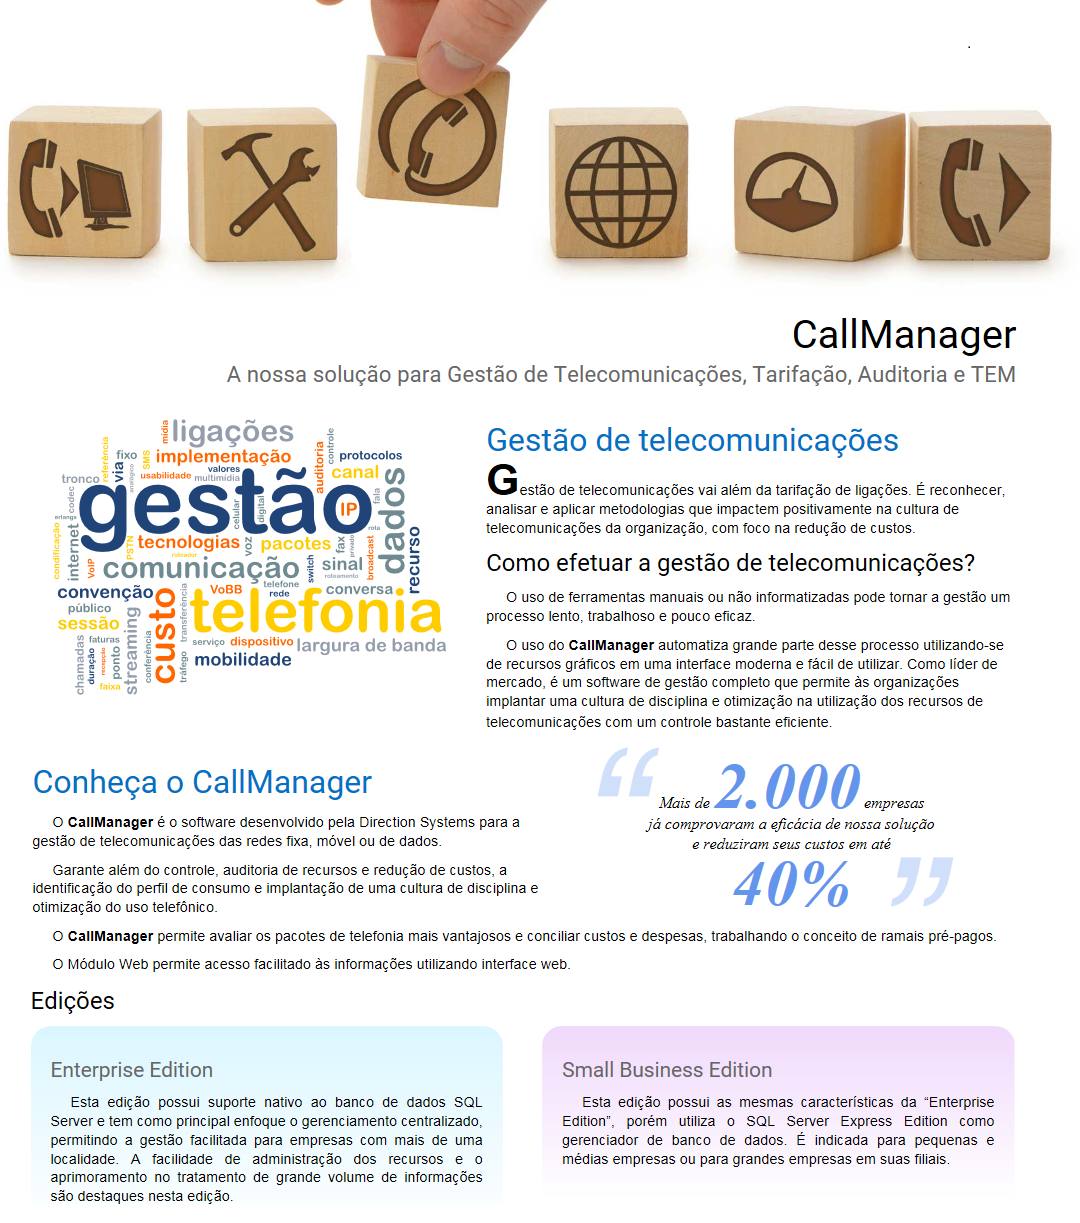 callmanager-banner